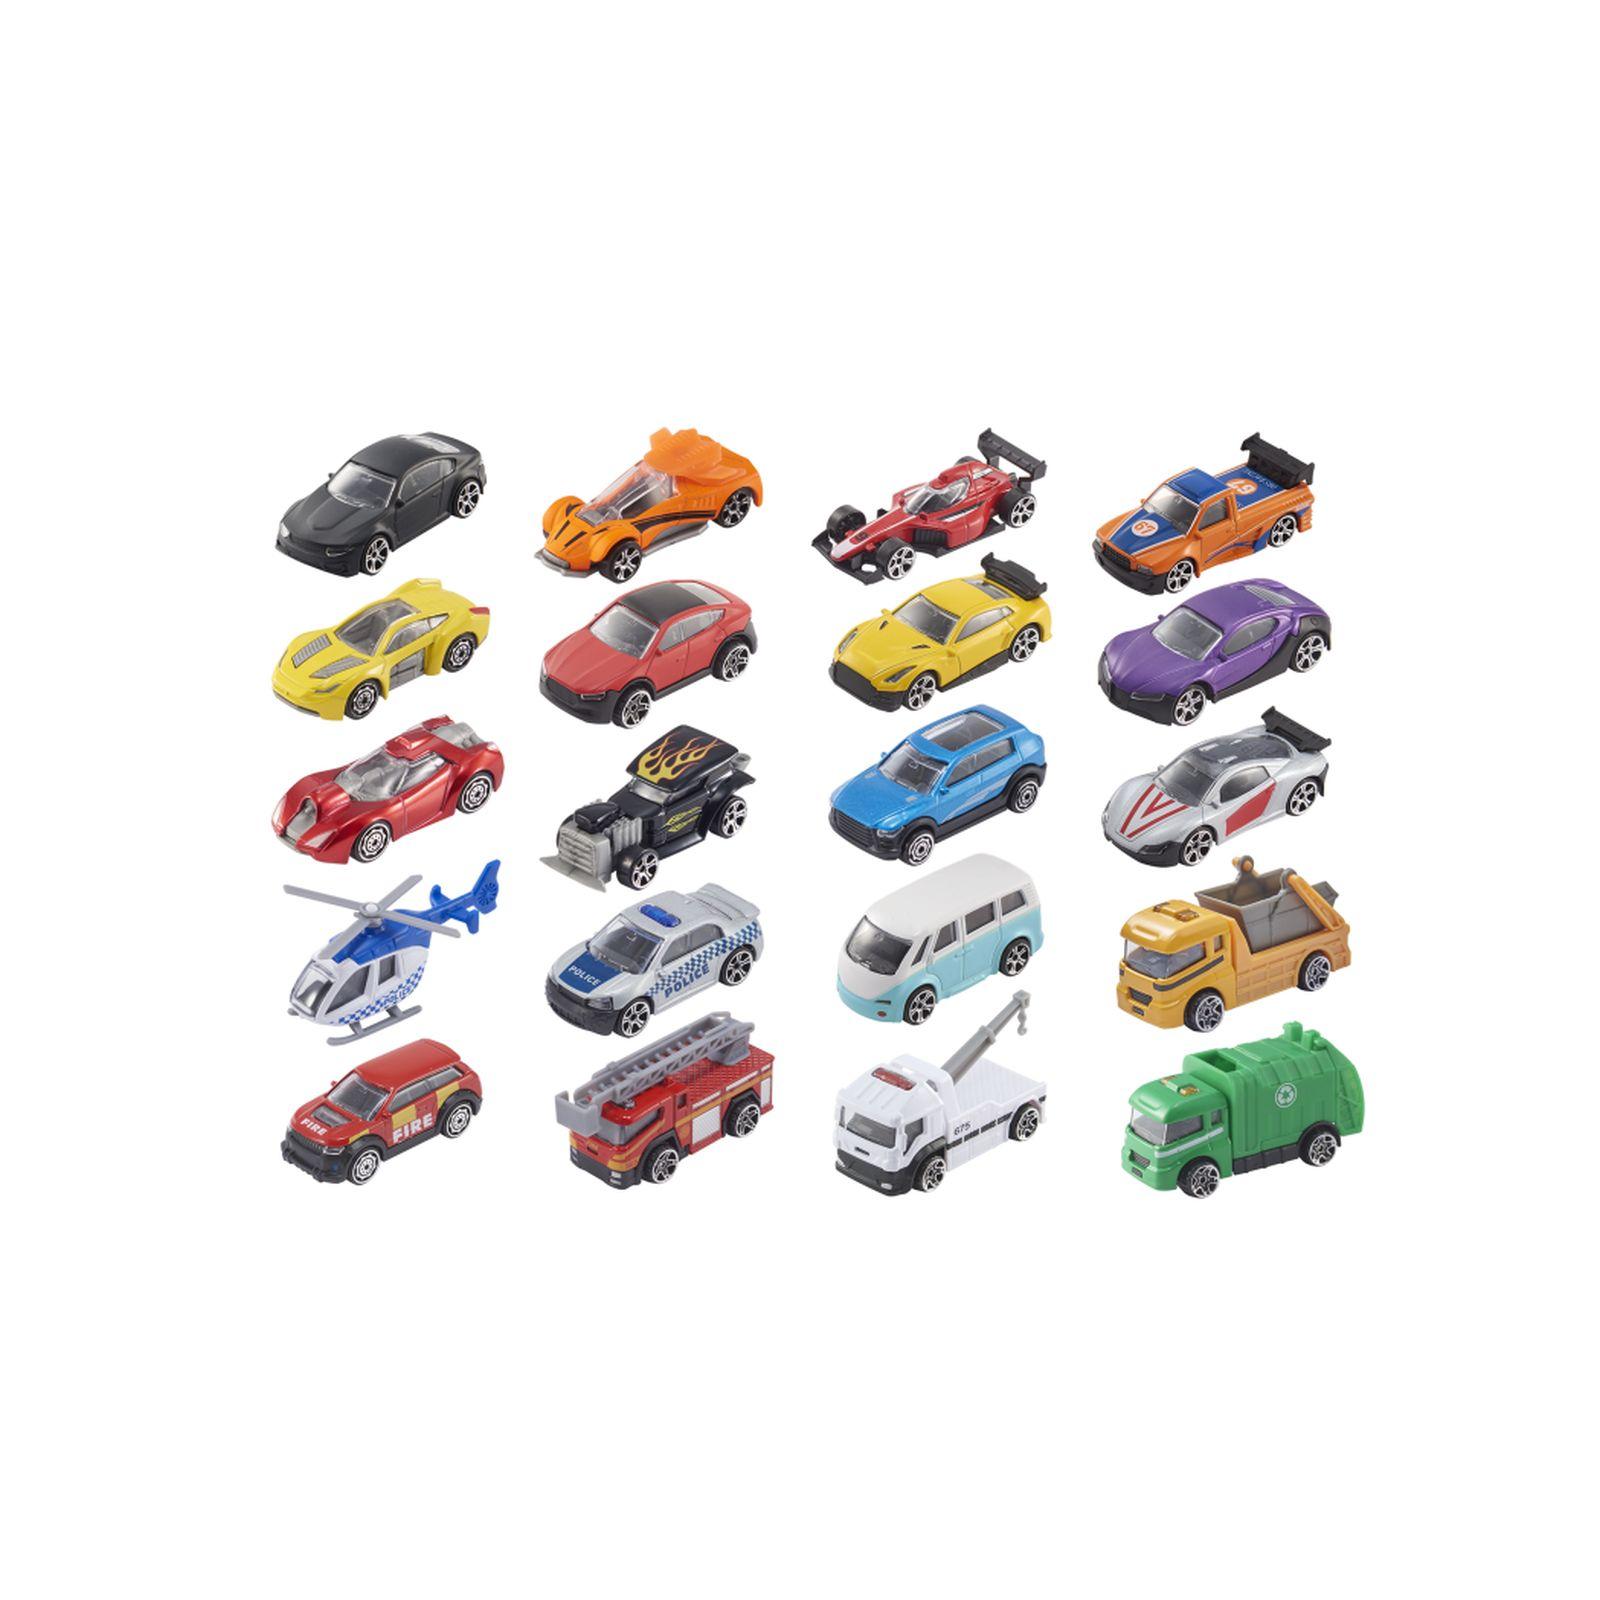 Set 10 auto street cars - MOTOR&CO